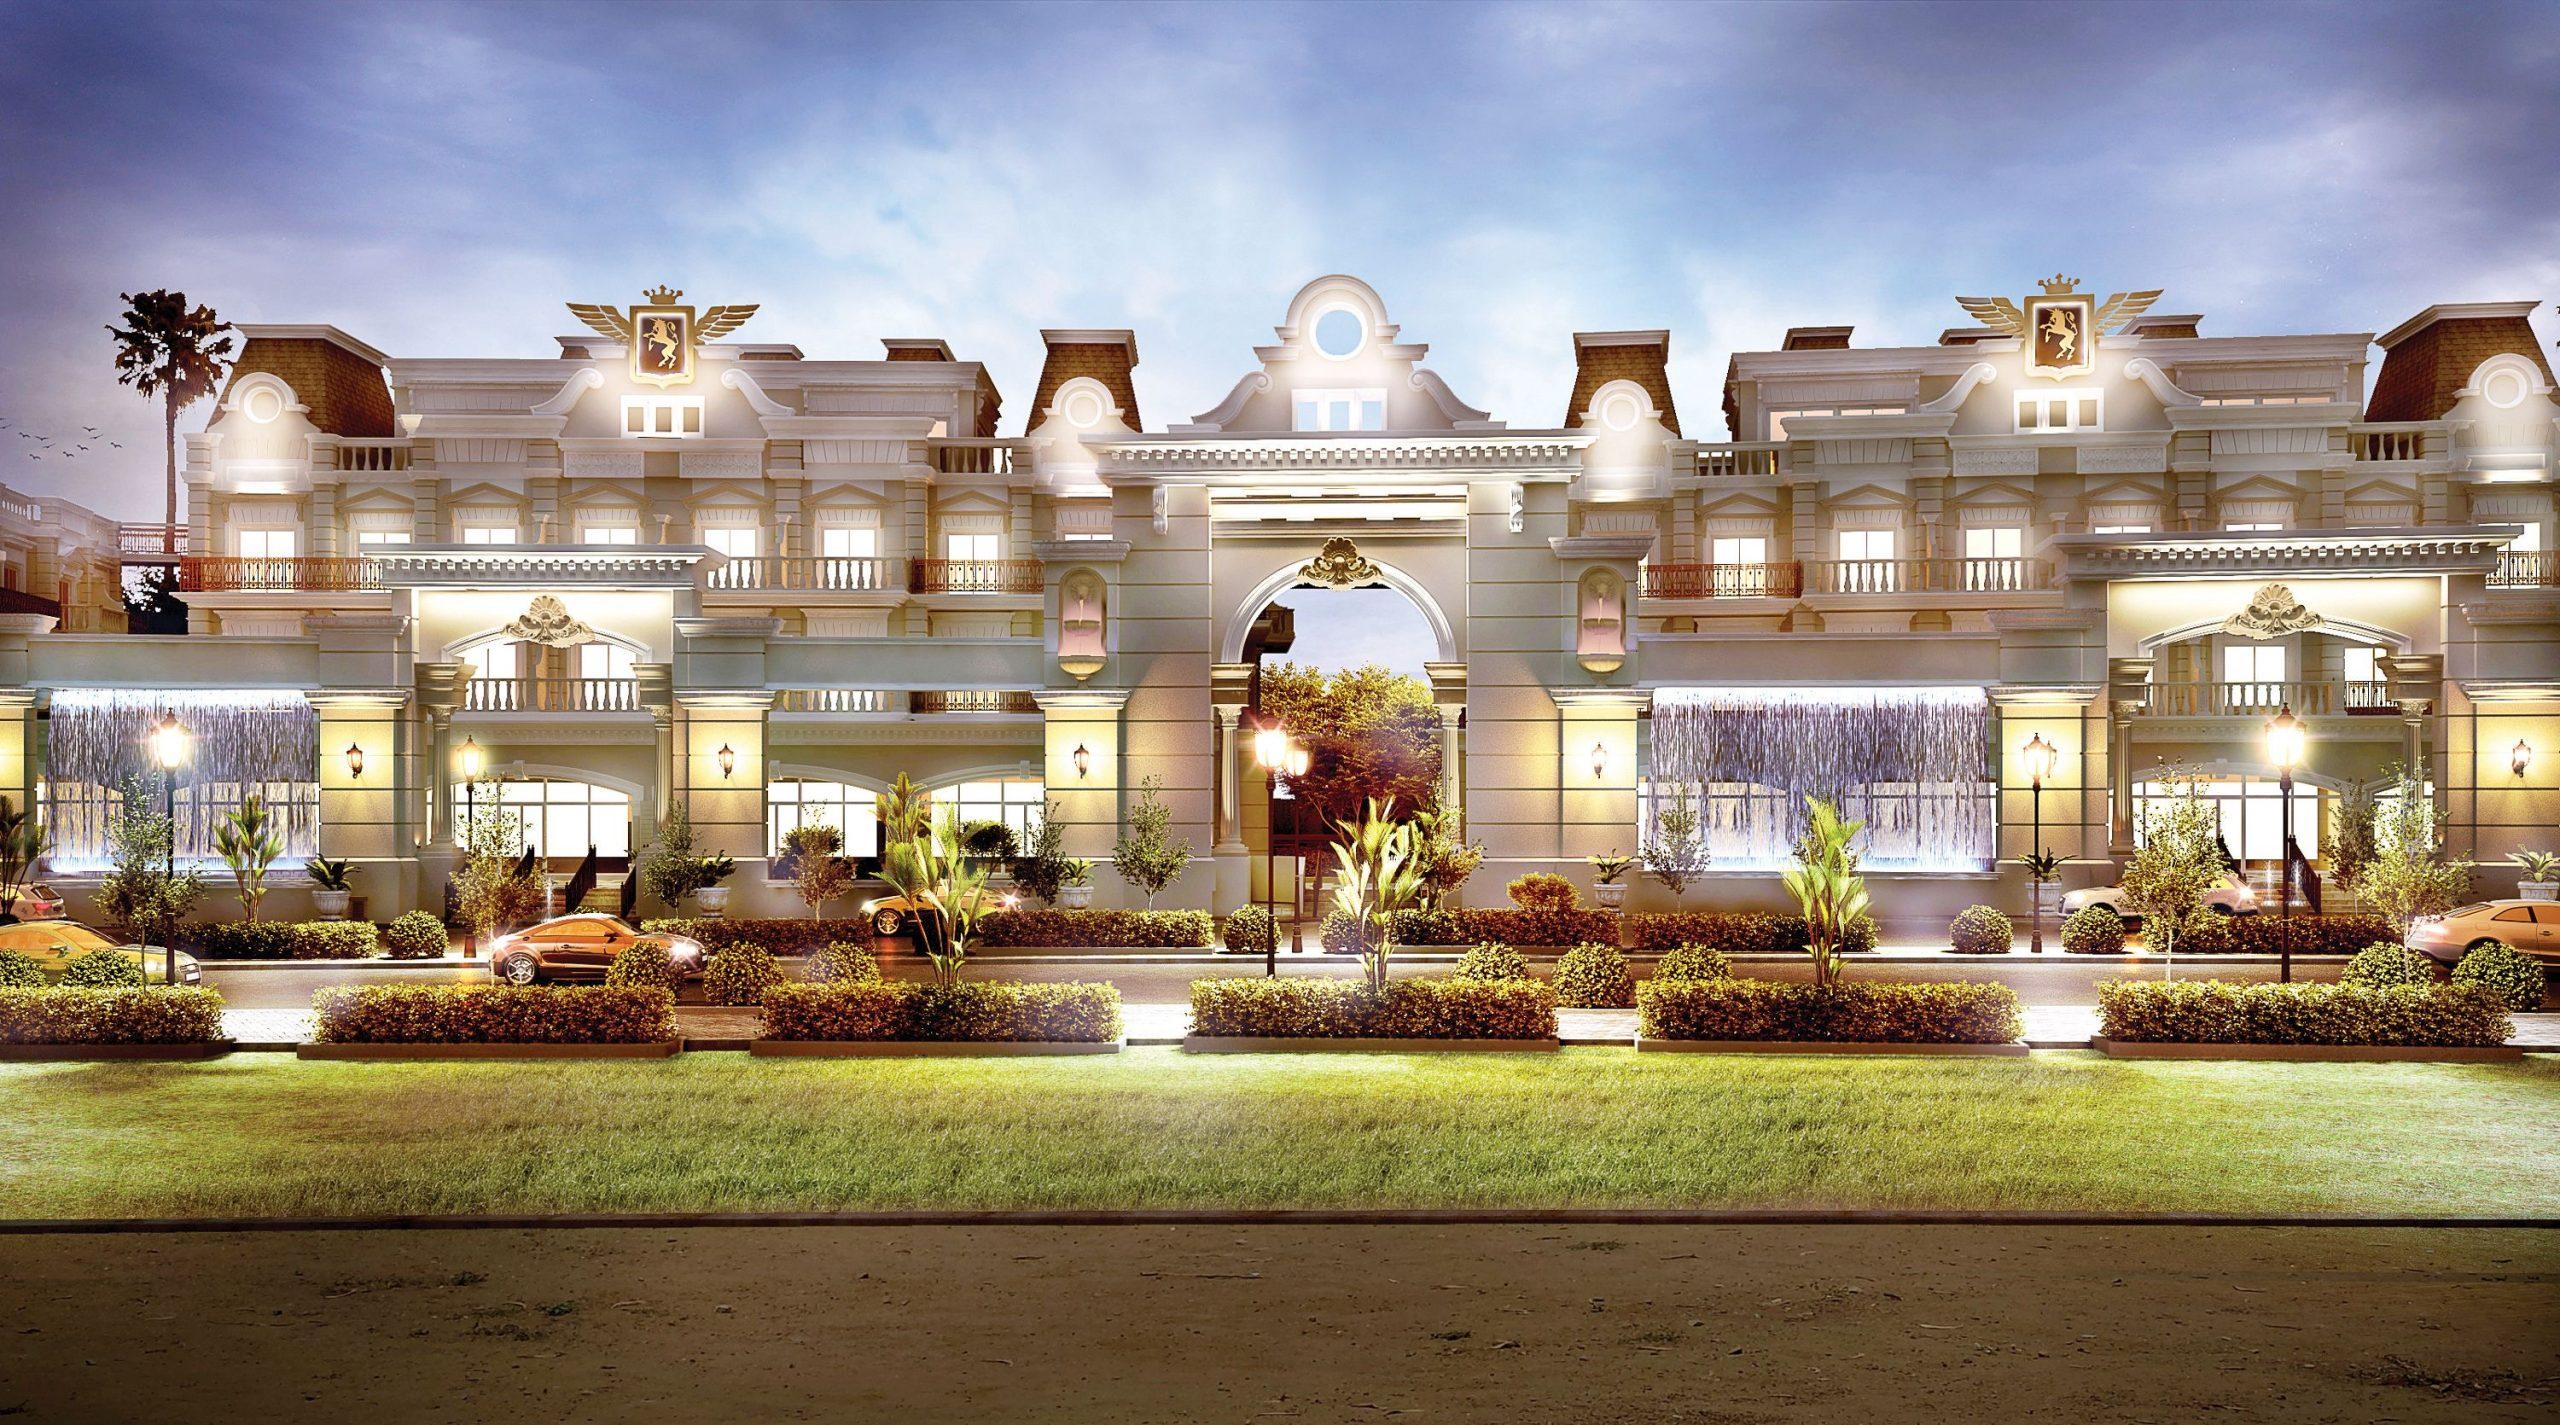 1 BHK Apartment For Sale in Arjan – Dubai